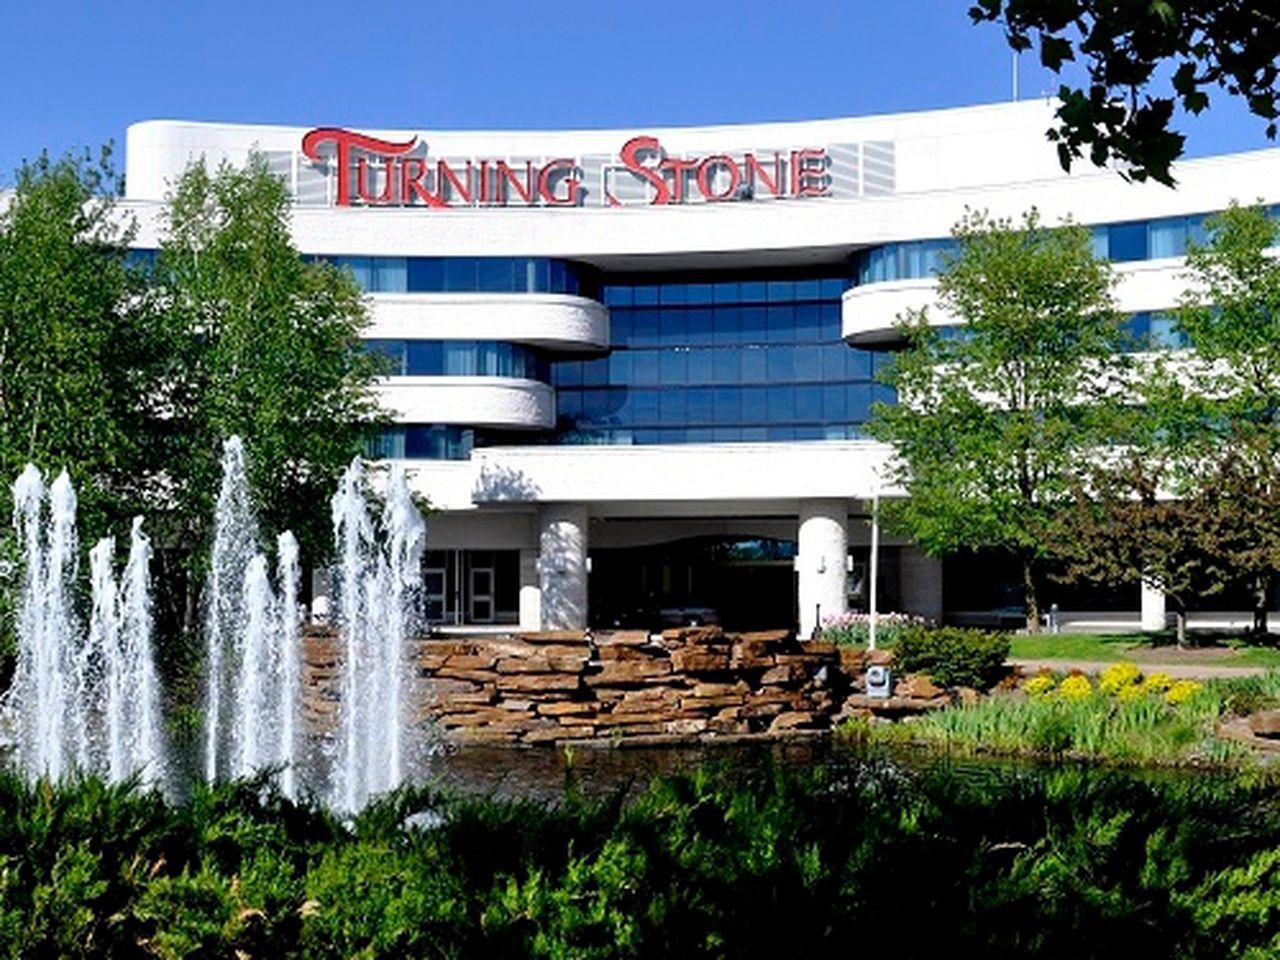 Turning Stone February Bingo Calender 2020 | Printable Throughout Turning Stone February Bingo Schedule